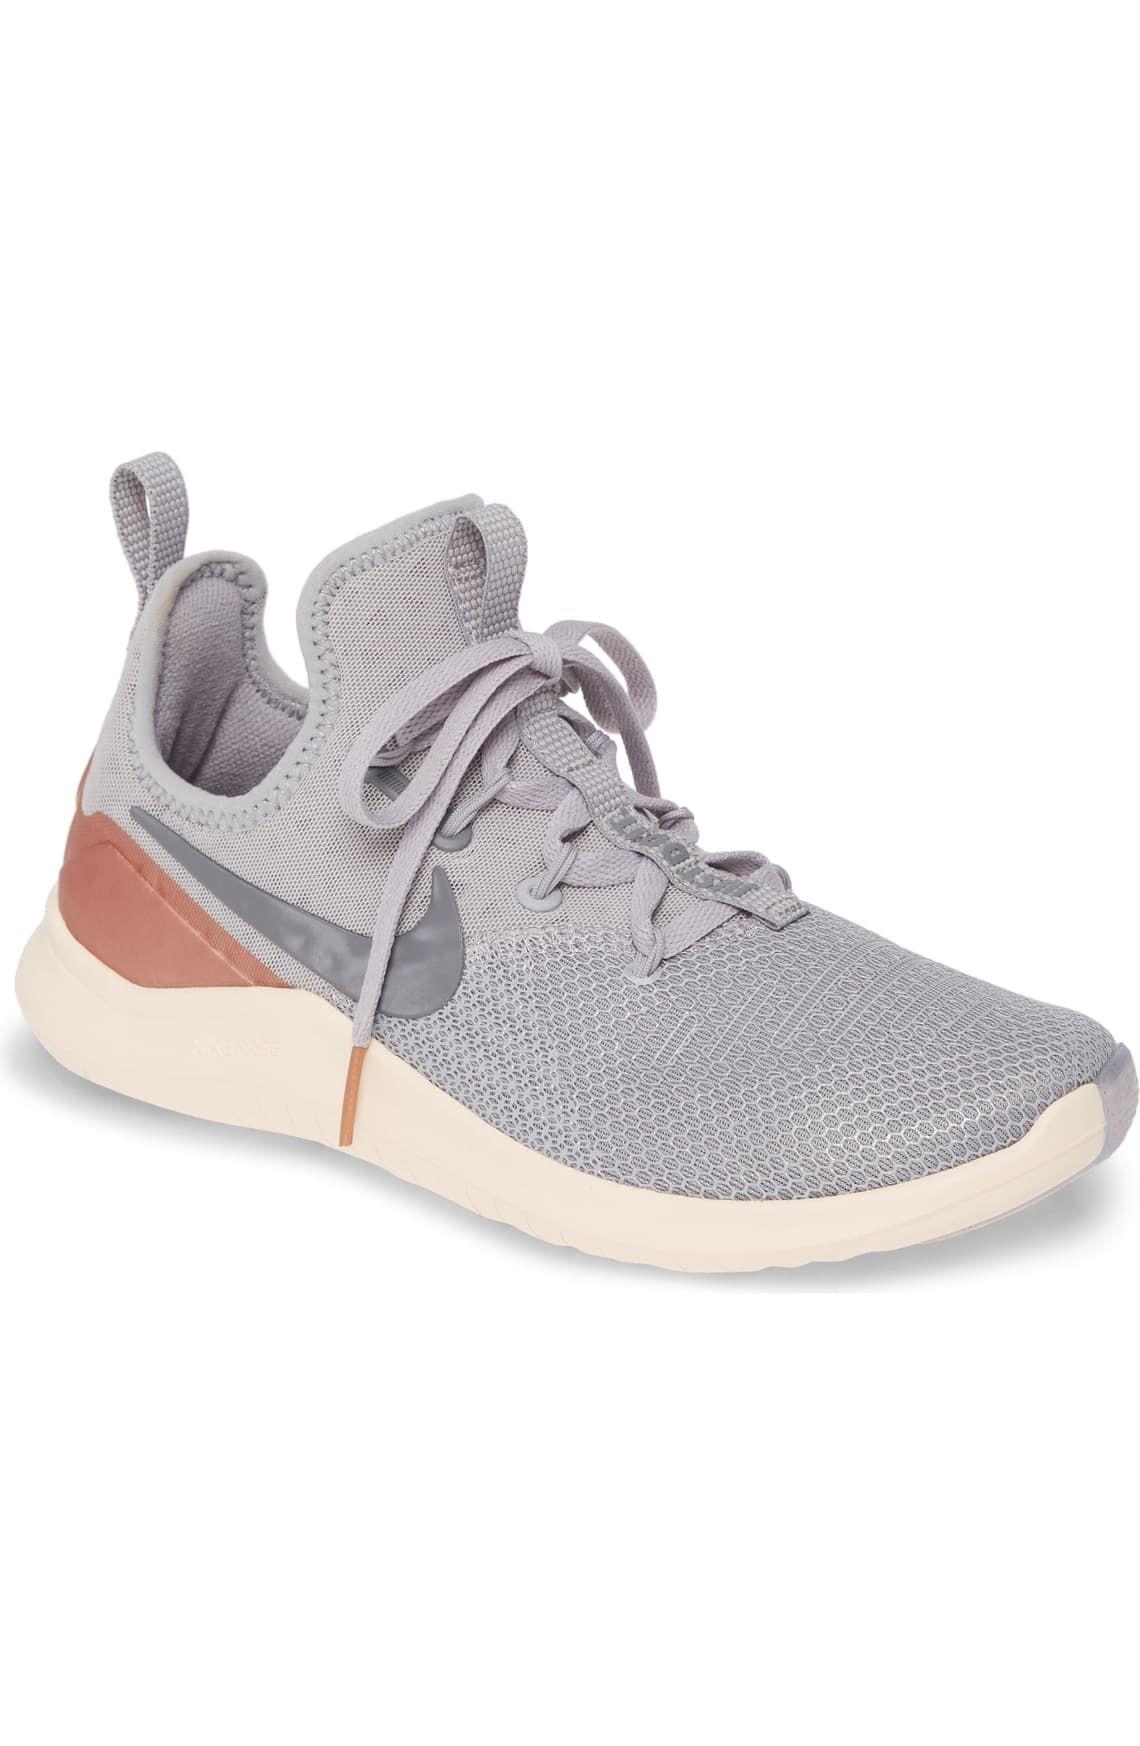 labor day shoe sales 2019